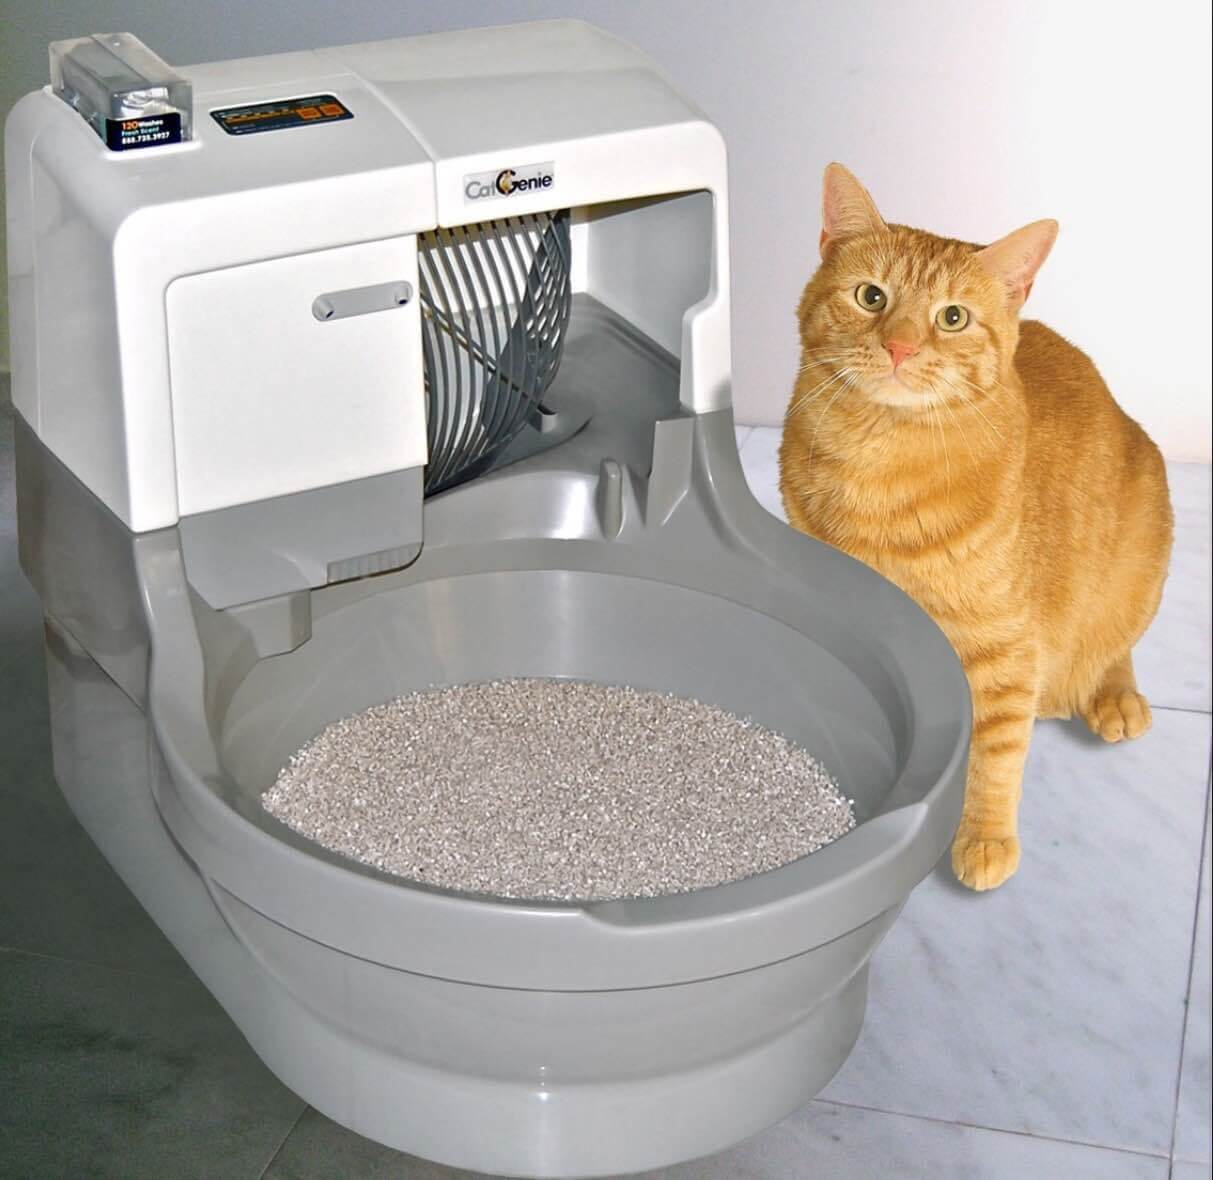 Catgenie Self Washing Amp Flushing Cat Litter Box Automatic